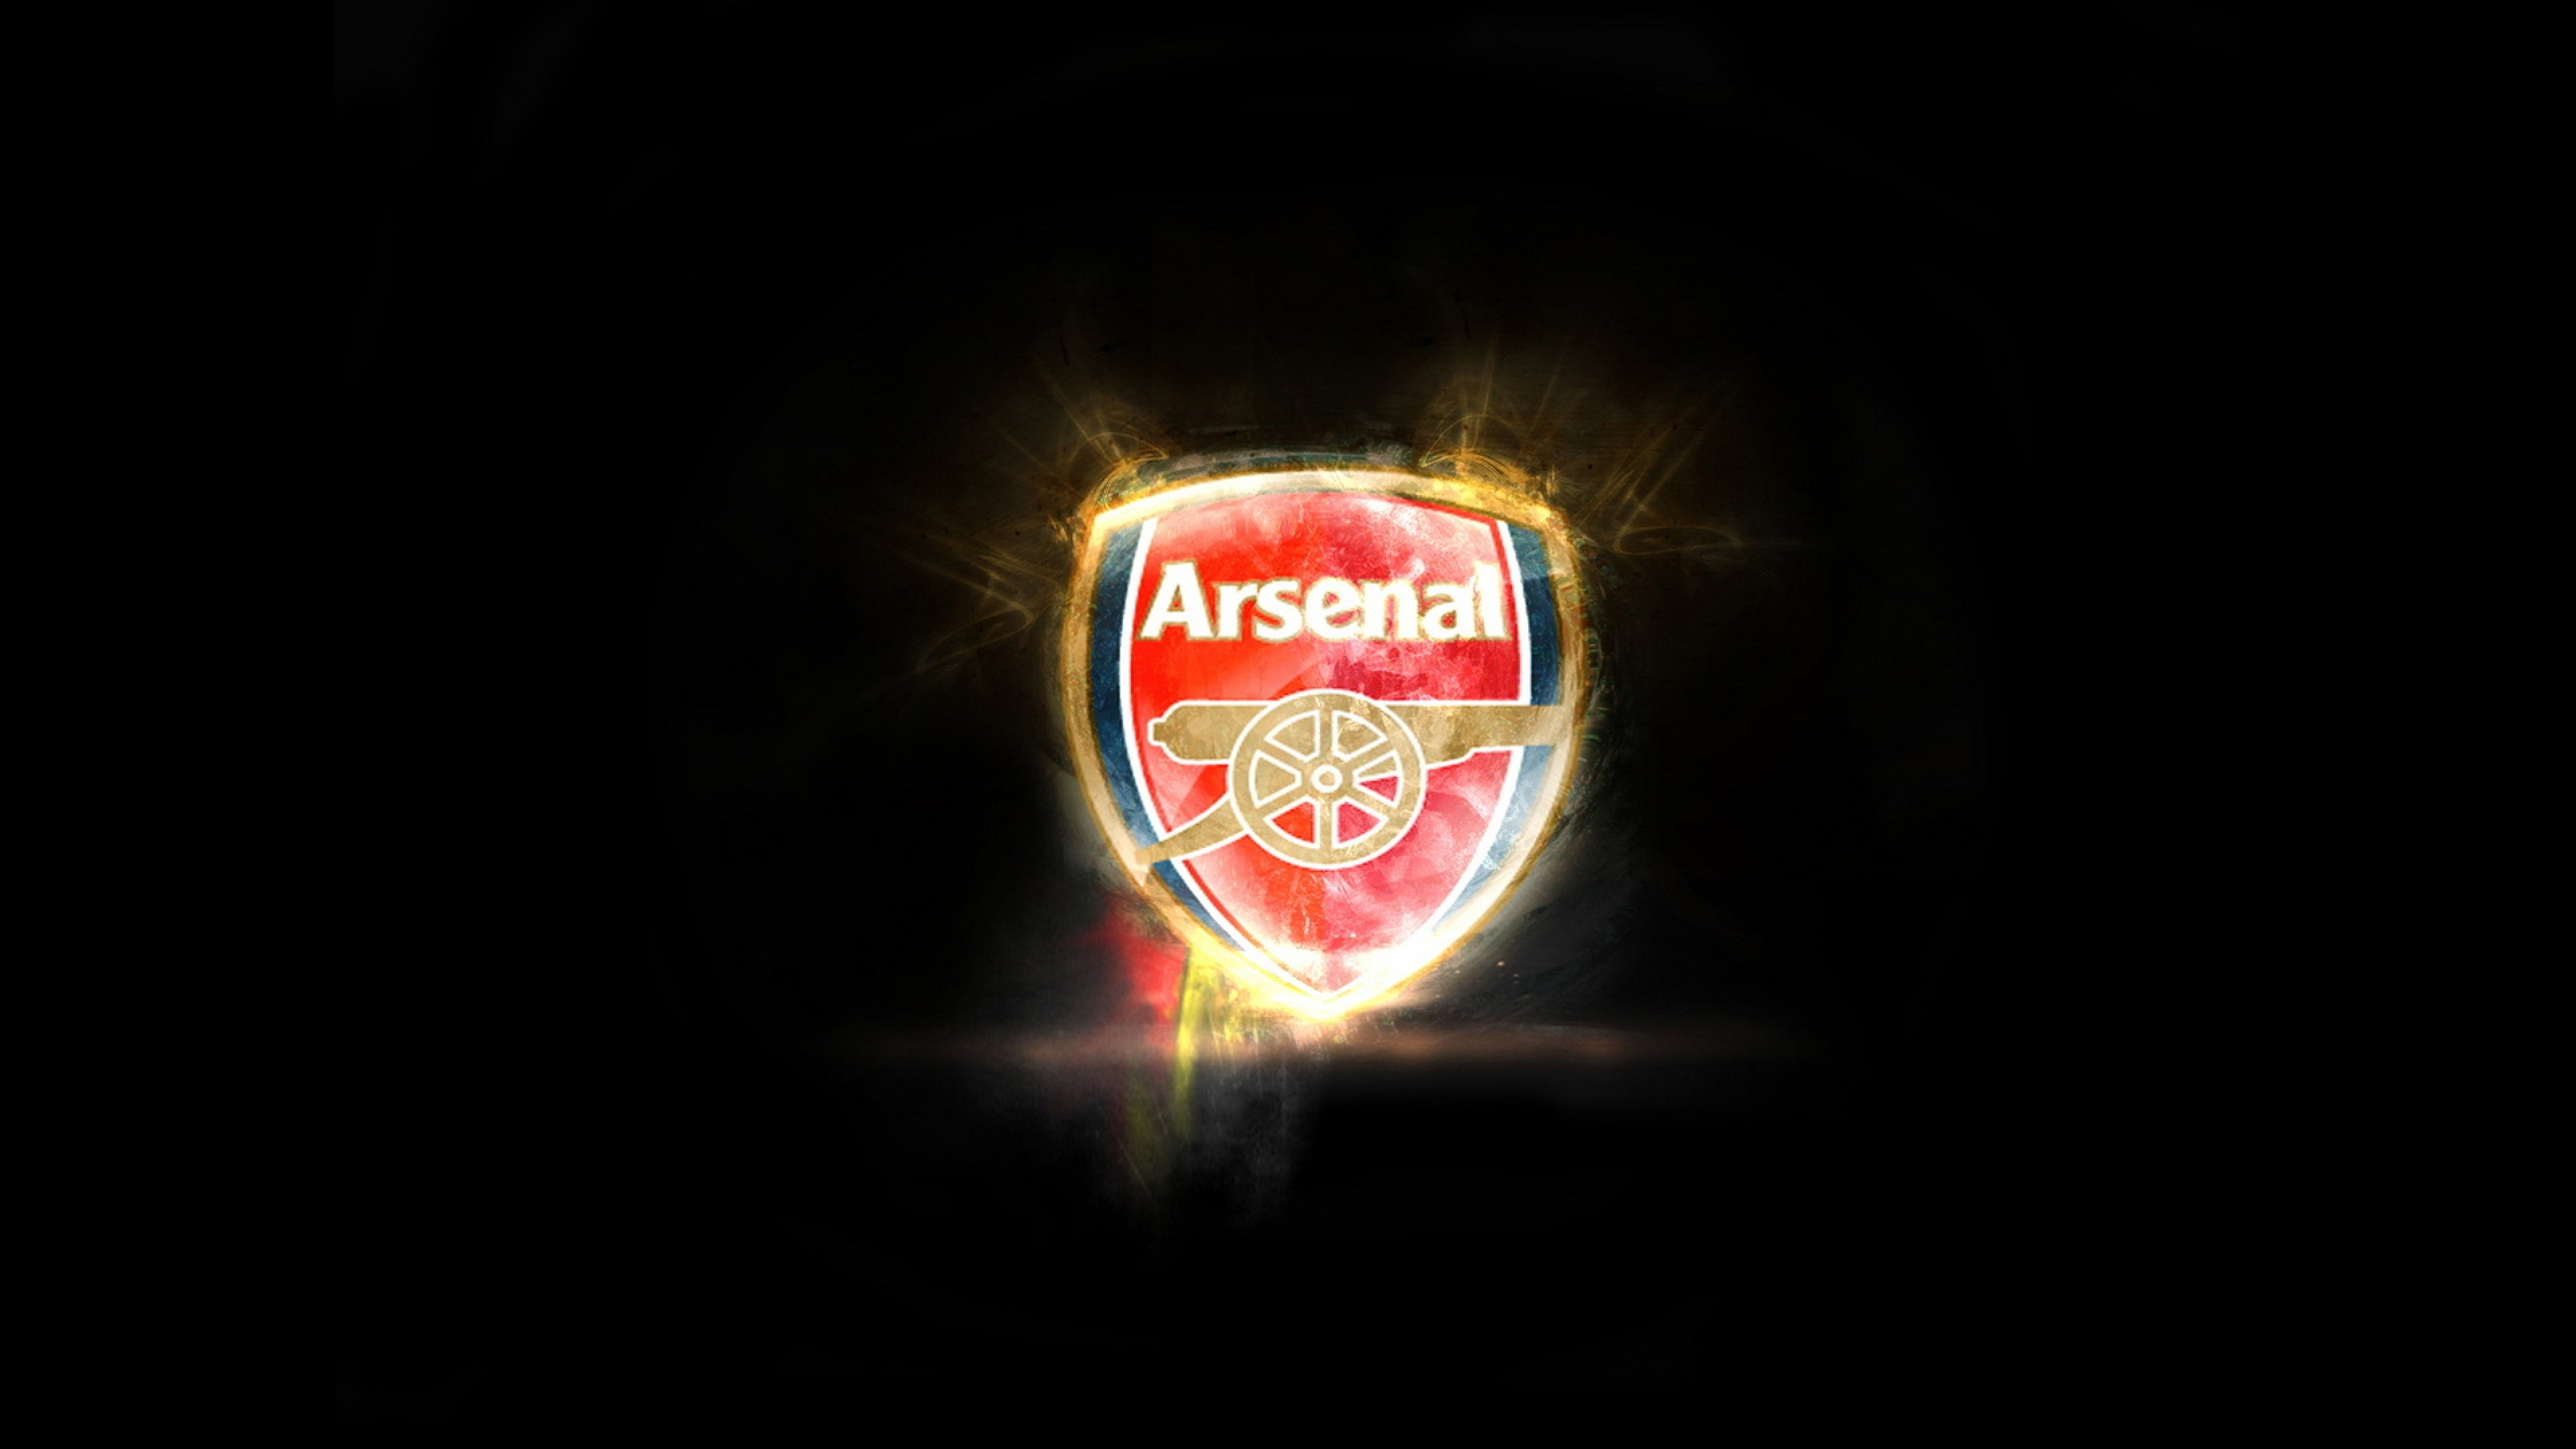 Wallpaper Arsenal Hd Arsenal Logo Wallpapers Pixelstalk Net